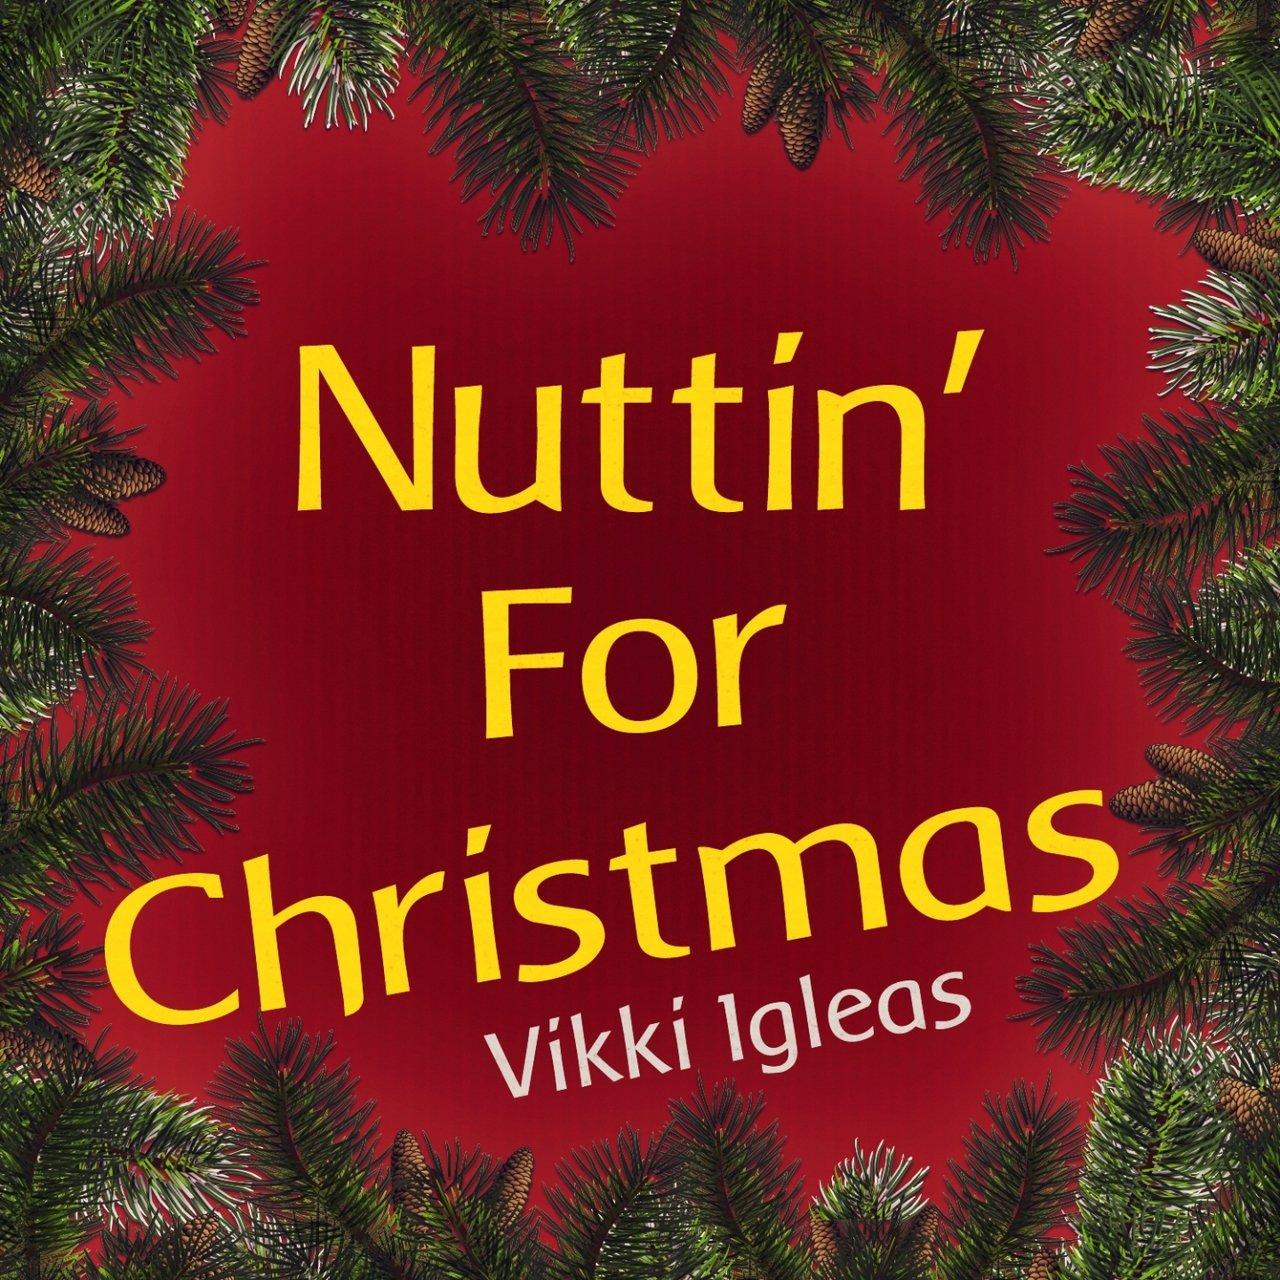 TIDAL: Listen to Vikki Igleas on TIDAL